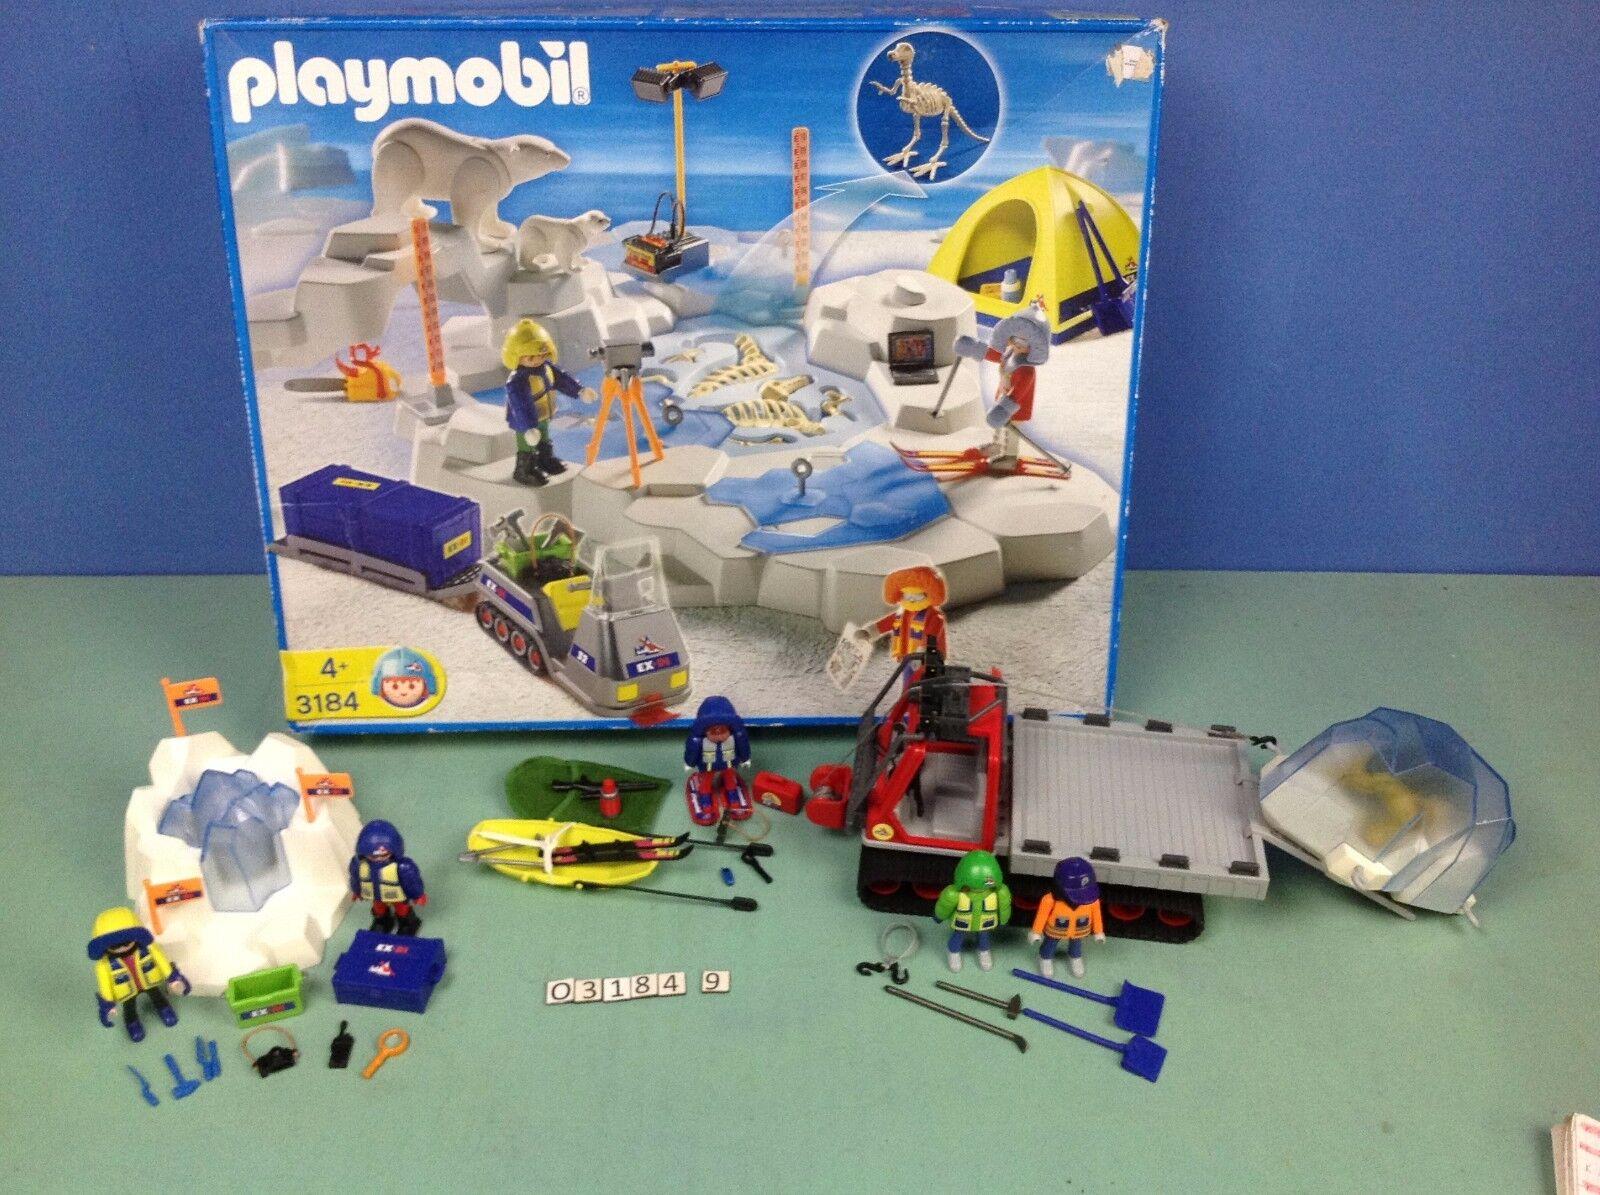 (O3184.9) playmobil Série  exploration polaire 4 ref complet 3184 3191 3194 3193  comprare a buon mercato